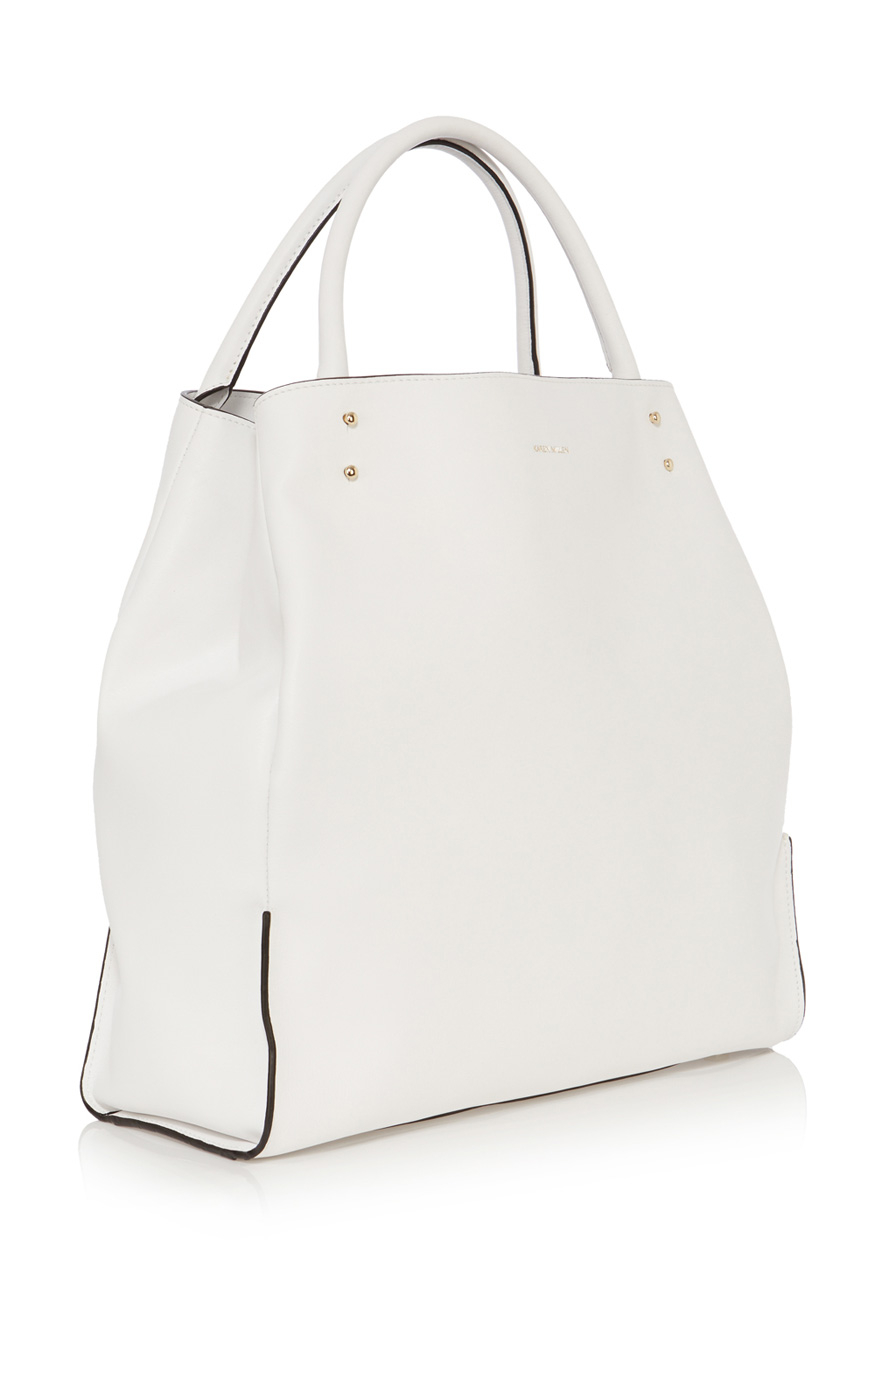 Karen Millen Ltd Edition Oversize Tote in White